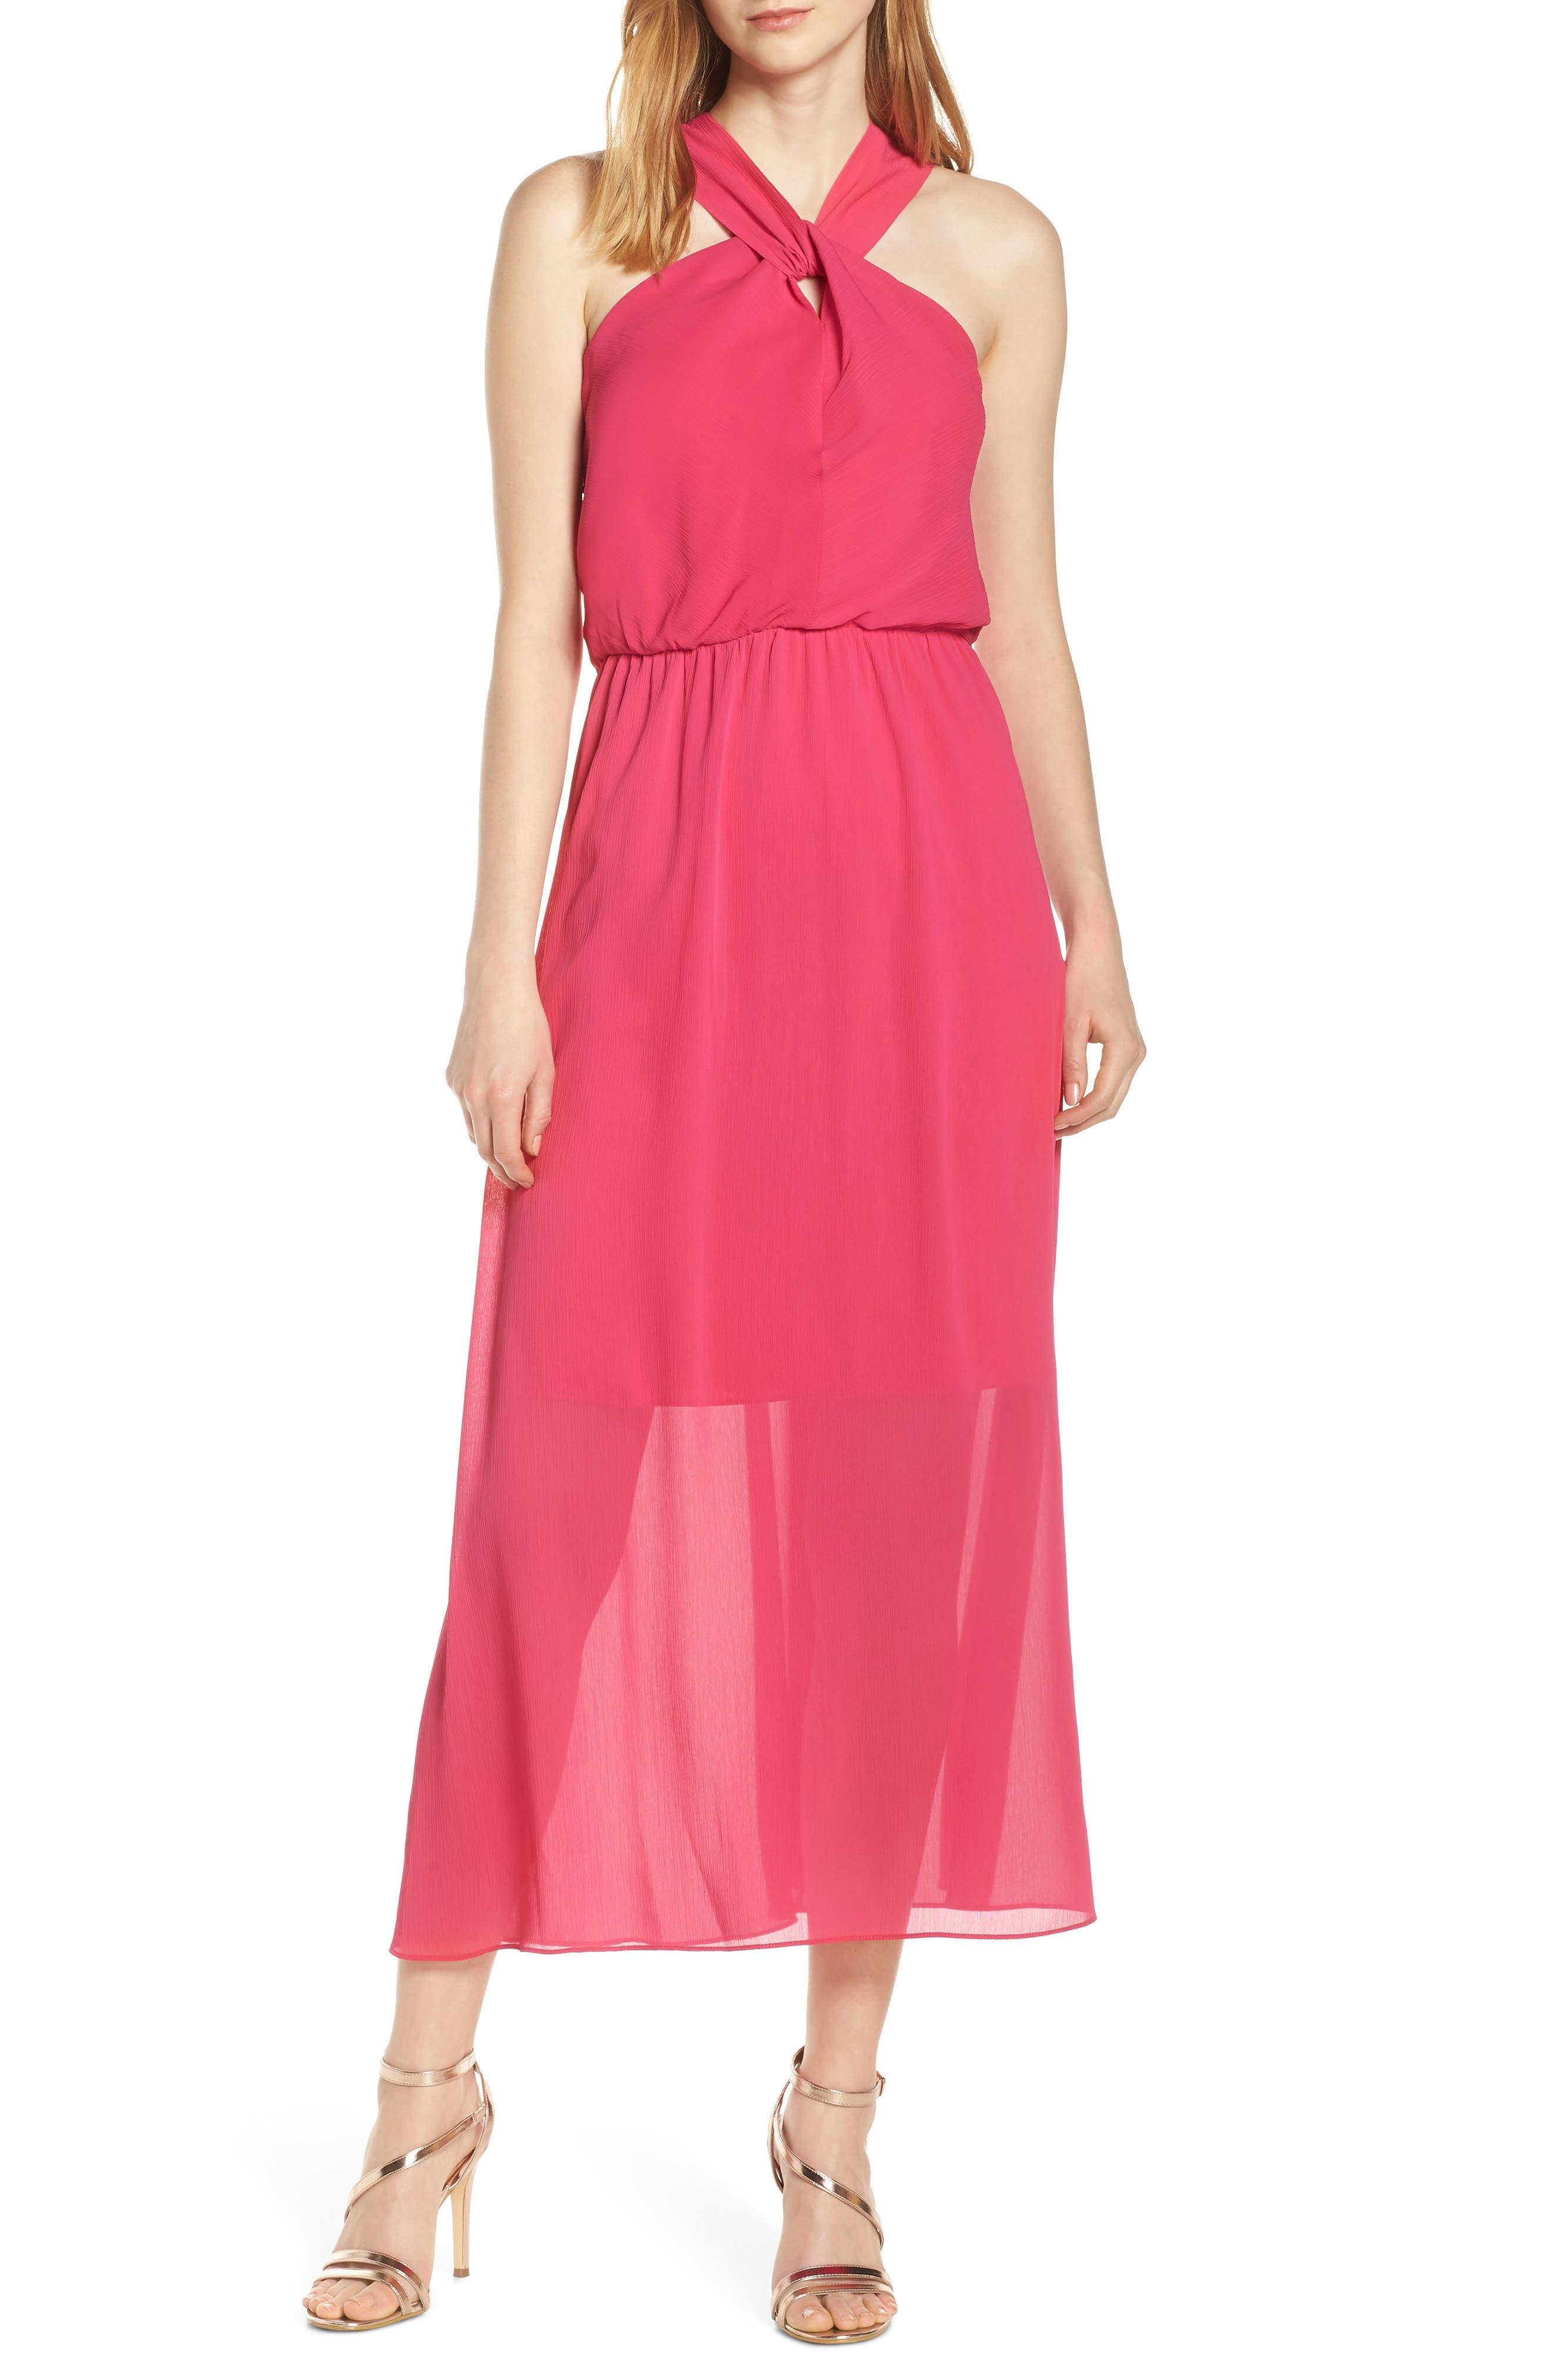 Sam Edelman Crisscross Neck Maxi Dress, Pink